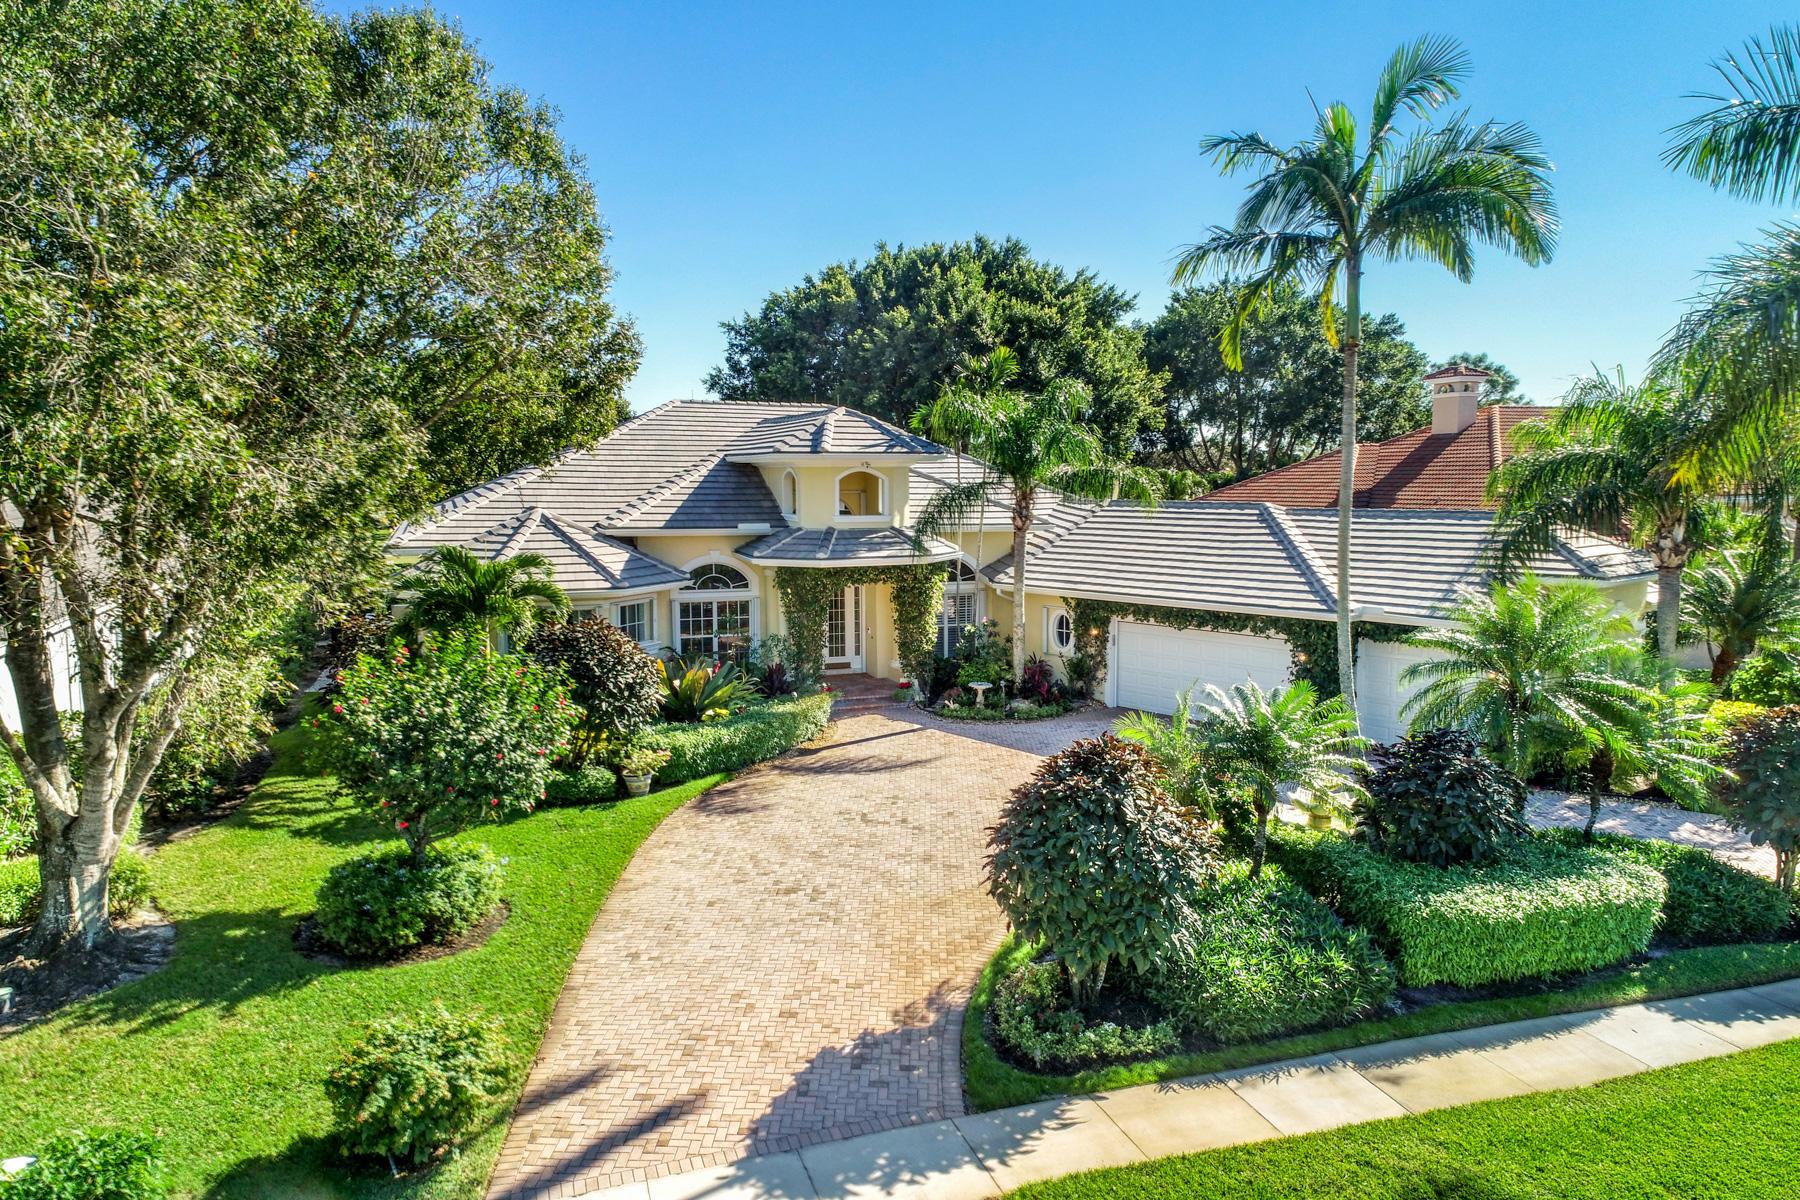 Details for 10141 Heronwood Lane, West Palm Beach, FL 33412